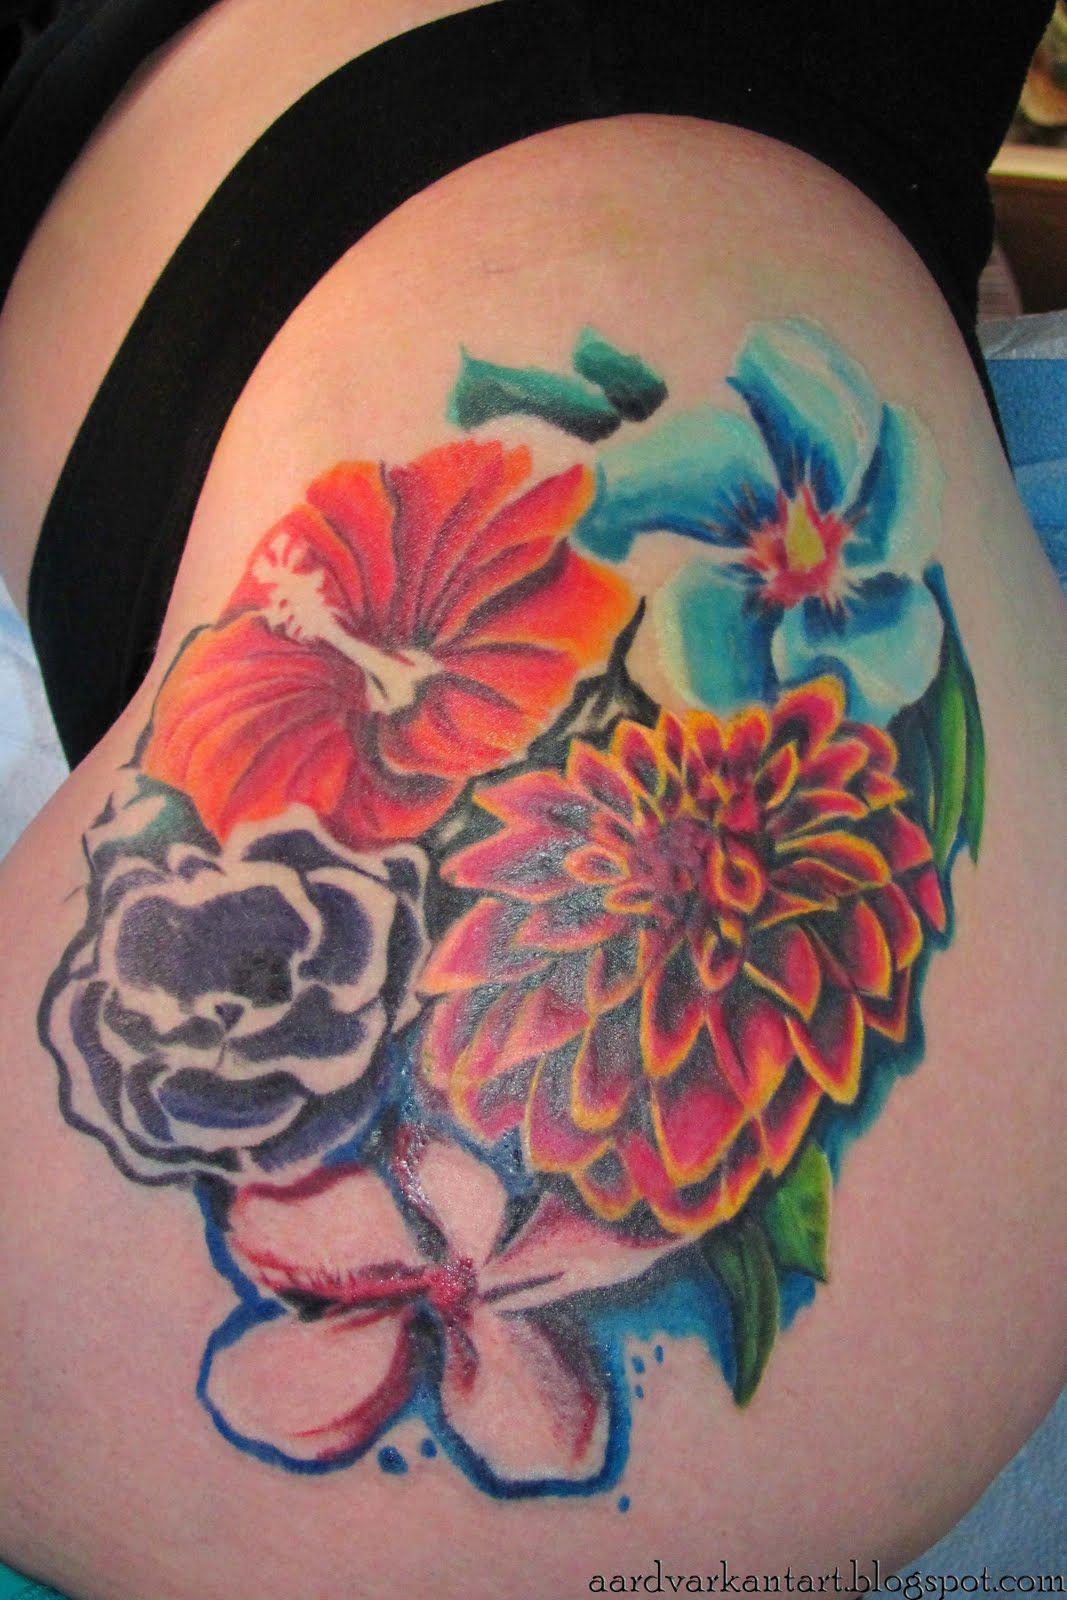 Hawaiian Hip Tattoos Wallpapers - http://wallpaperzoo.com/hawaiian ...